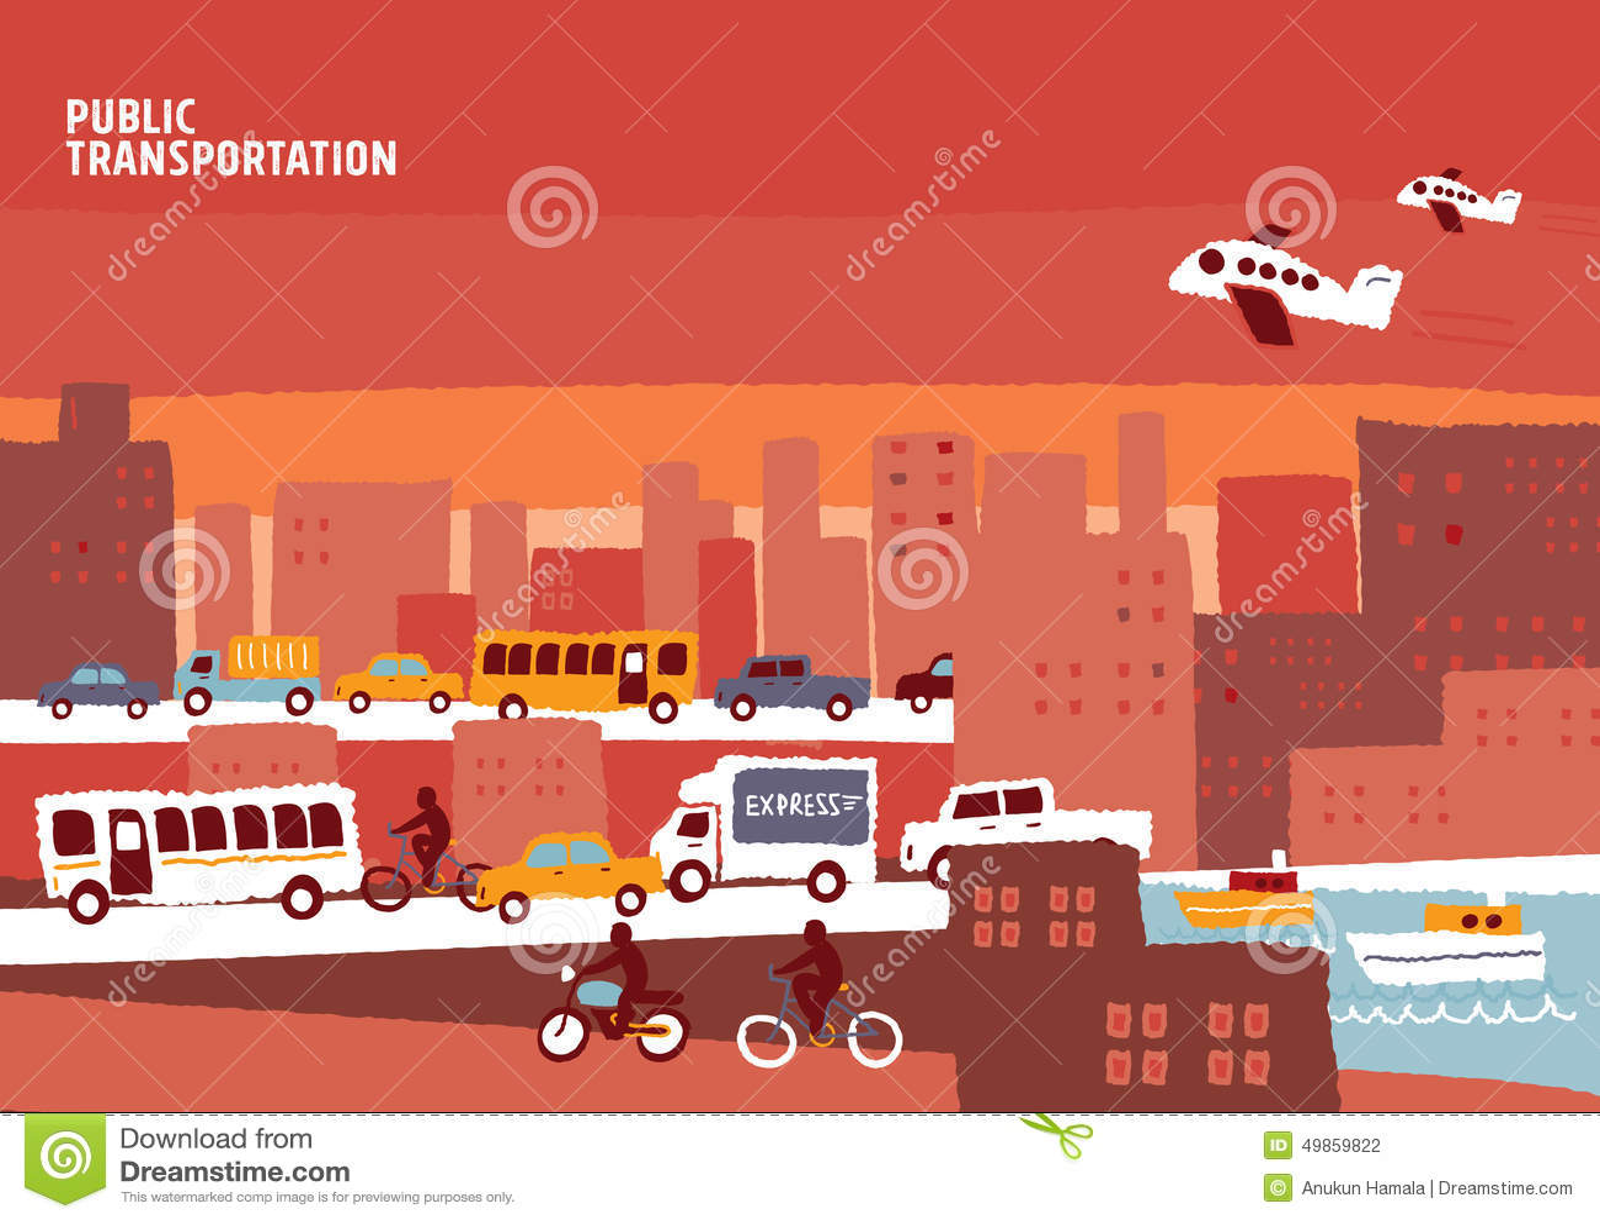 Public Transportation Info Graphic City Stock Vector